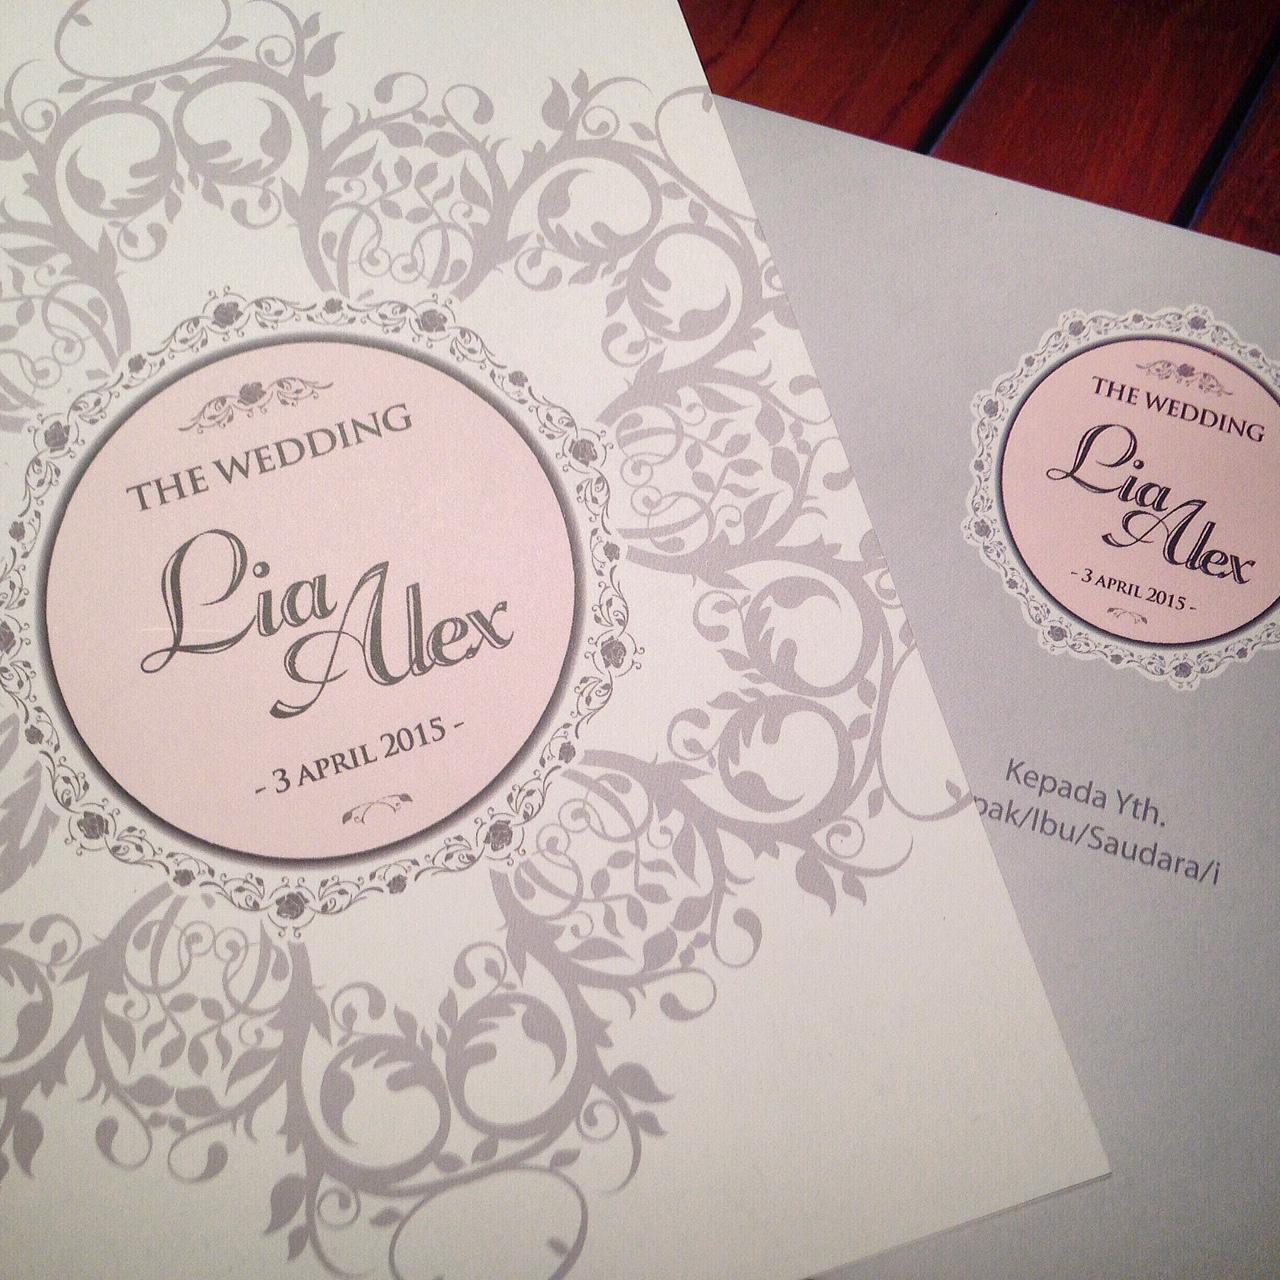 Ufahari studio design wedding invitations in jakarta ufahari studio design wedding invitations in jakarta bridestory stopboris Images